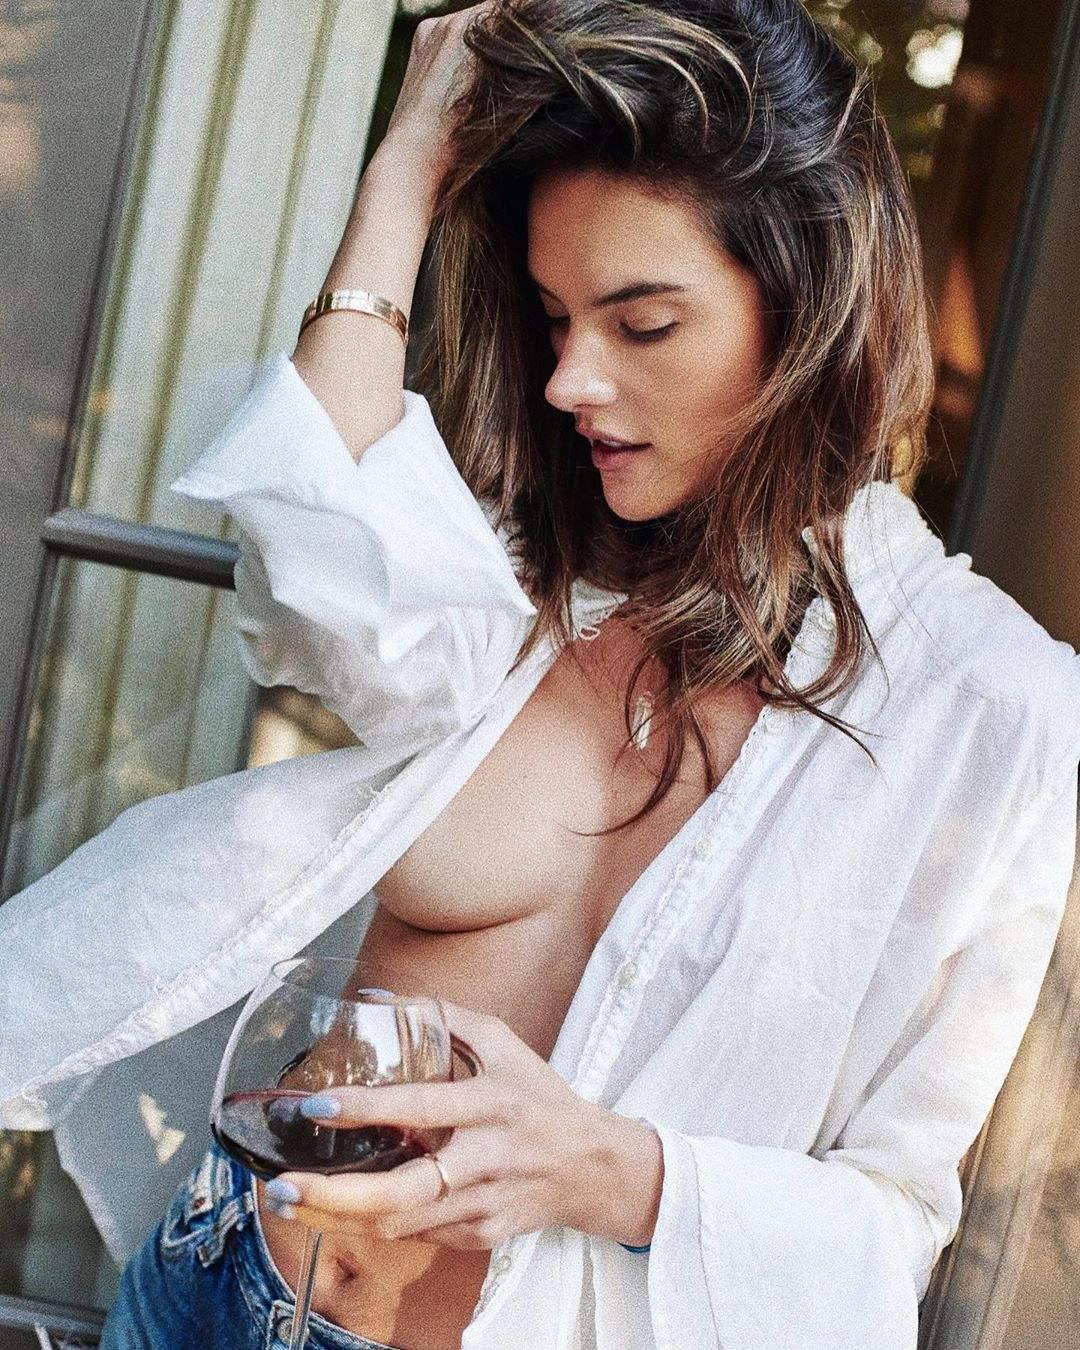 Alessandra Ambrosio – Sexy Sideboob In Hot Braless Photoshoot 0003